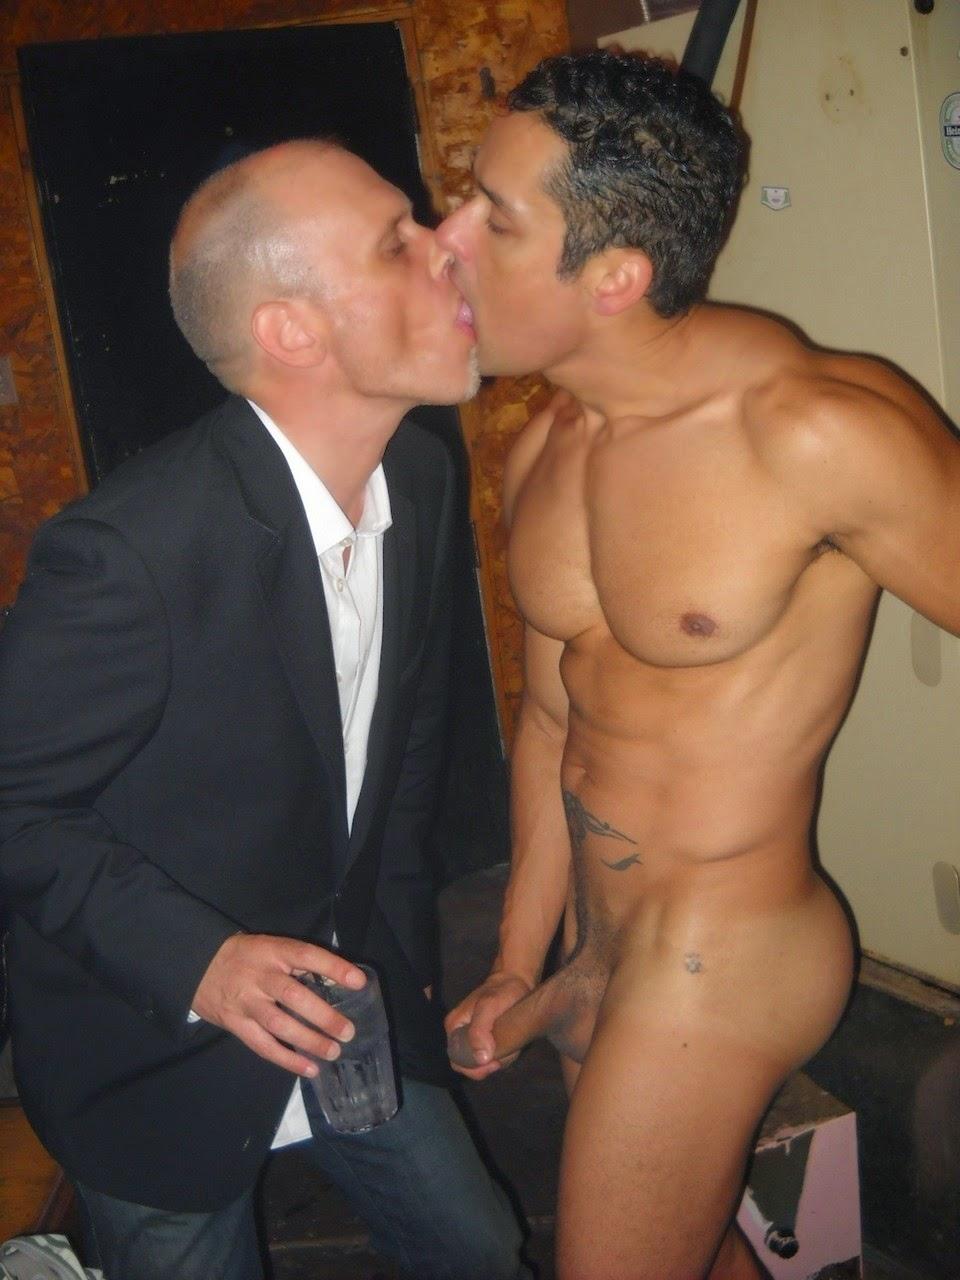 Videos Of Gays Kissing